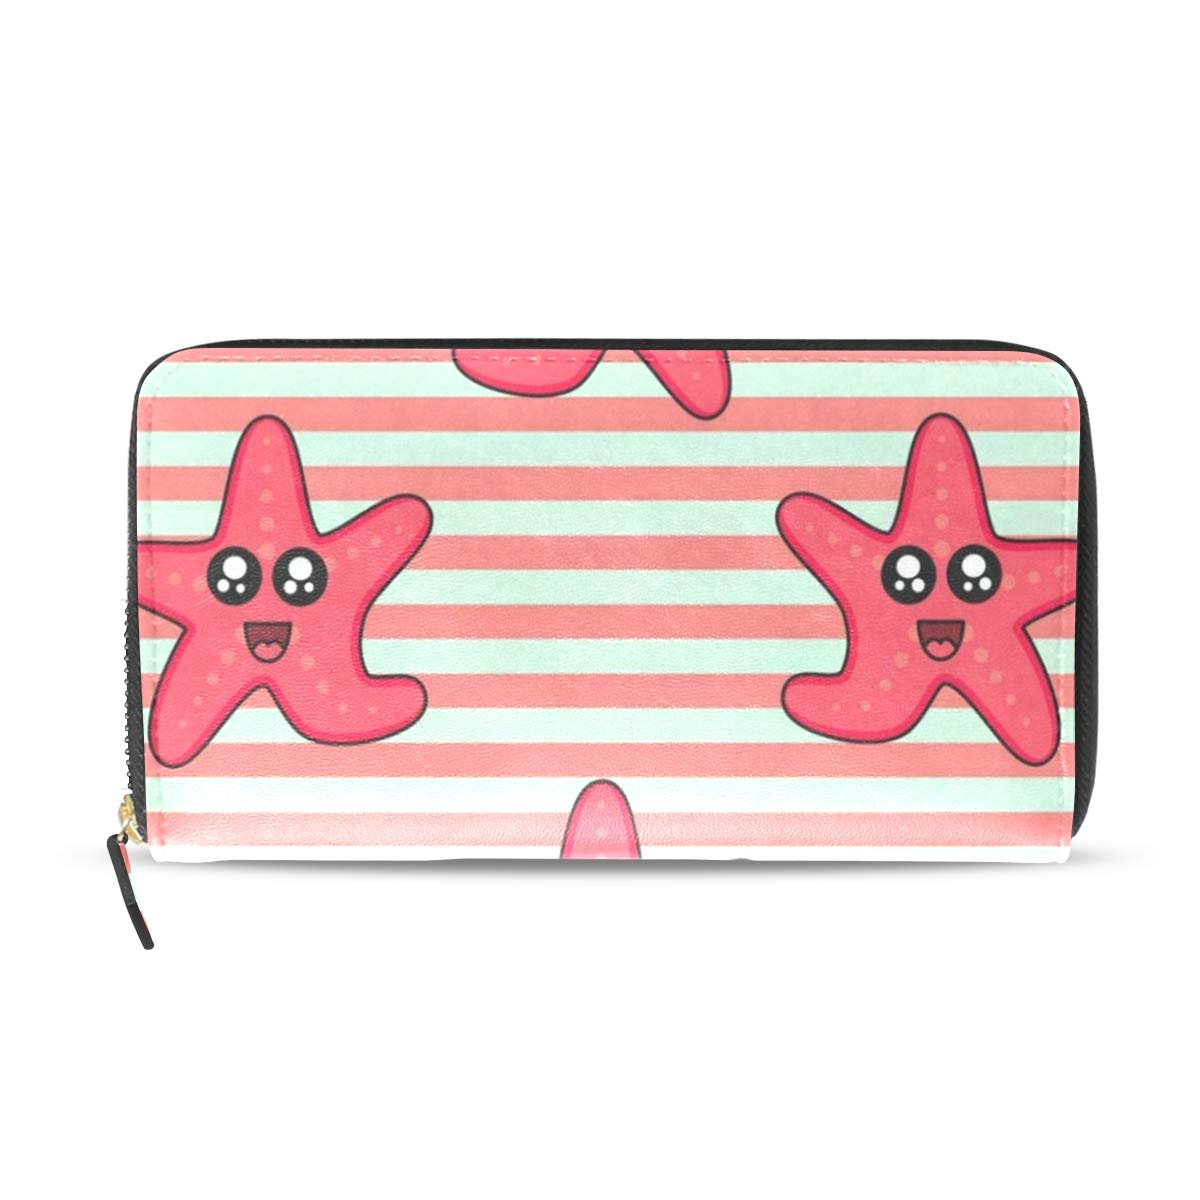 Womens Wallets Cute Starfish Leather Passport Wallet Change Purse Zip Handbags